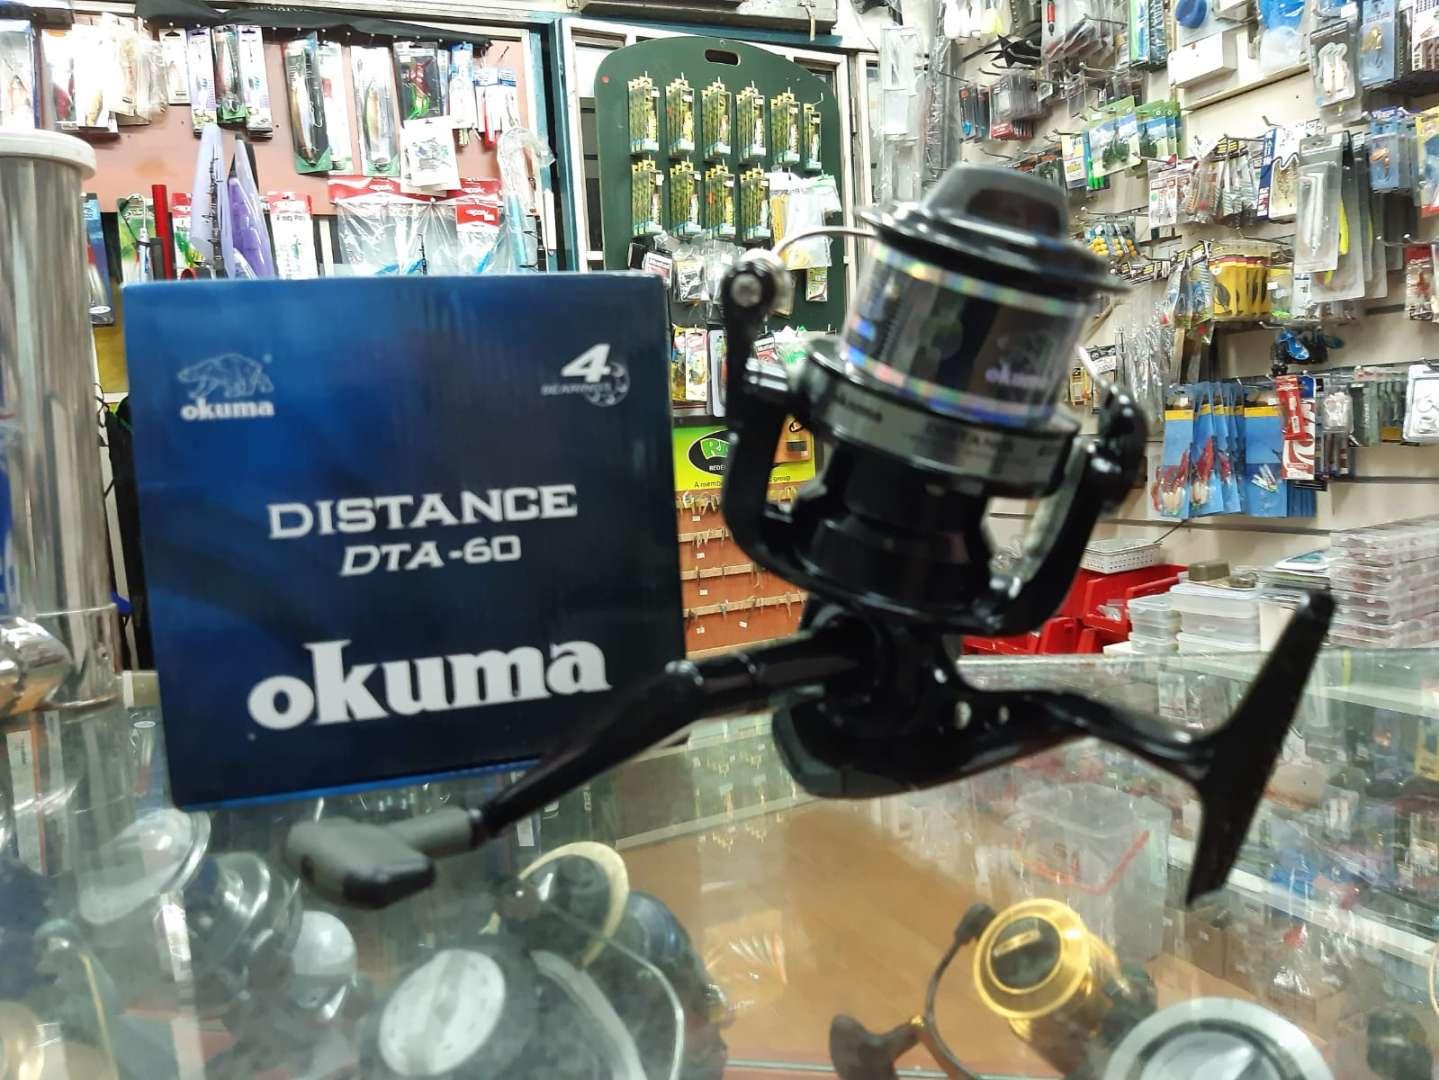 OKUMA DISTANCE DTA60